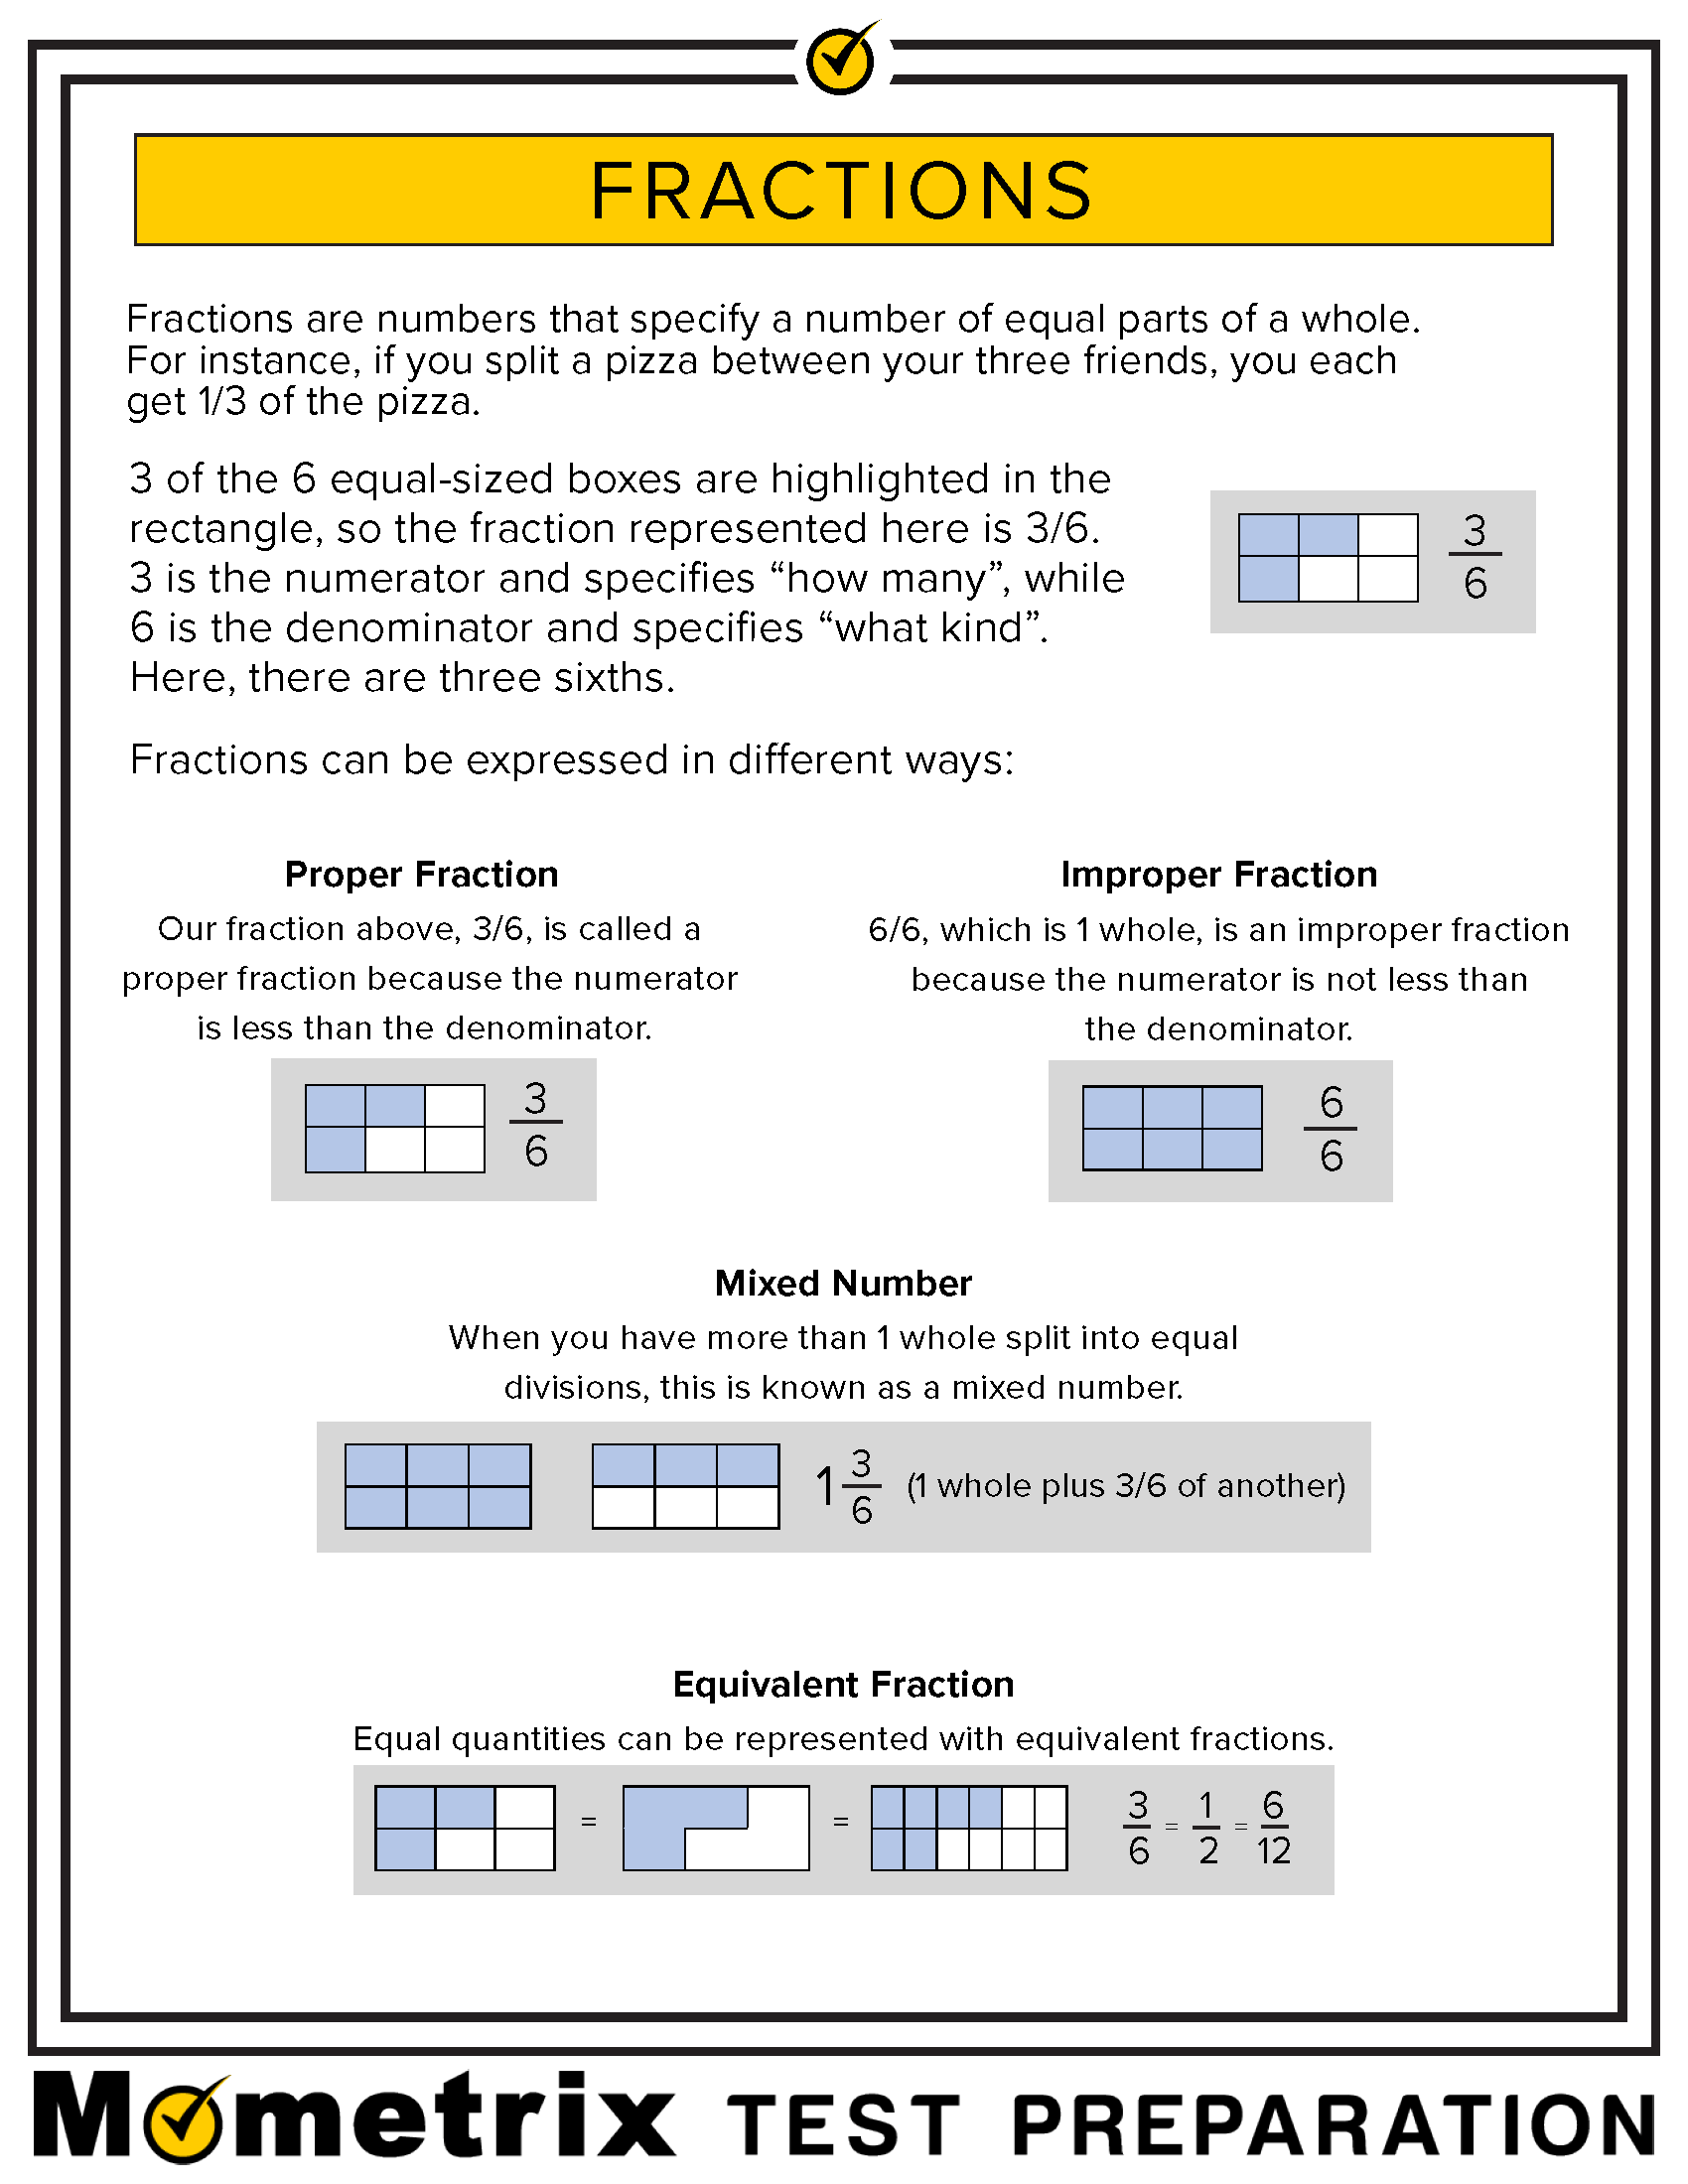 Mometrix infographic explaining fractions